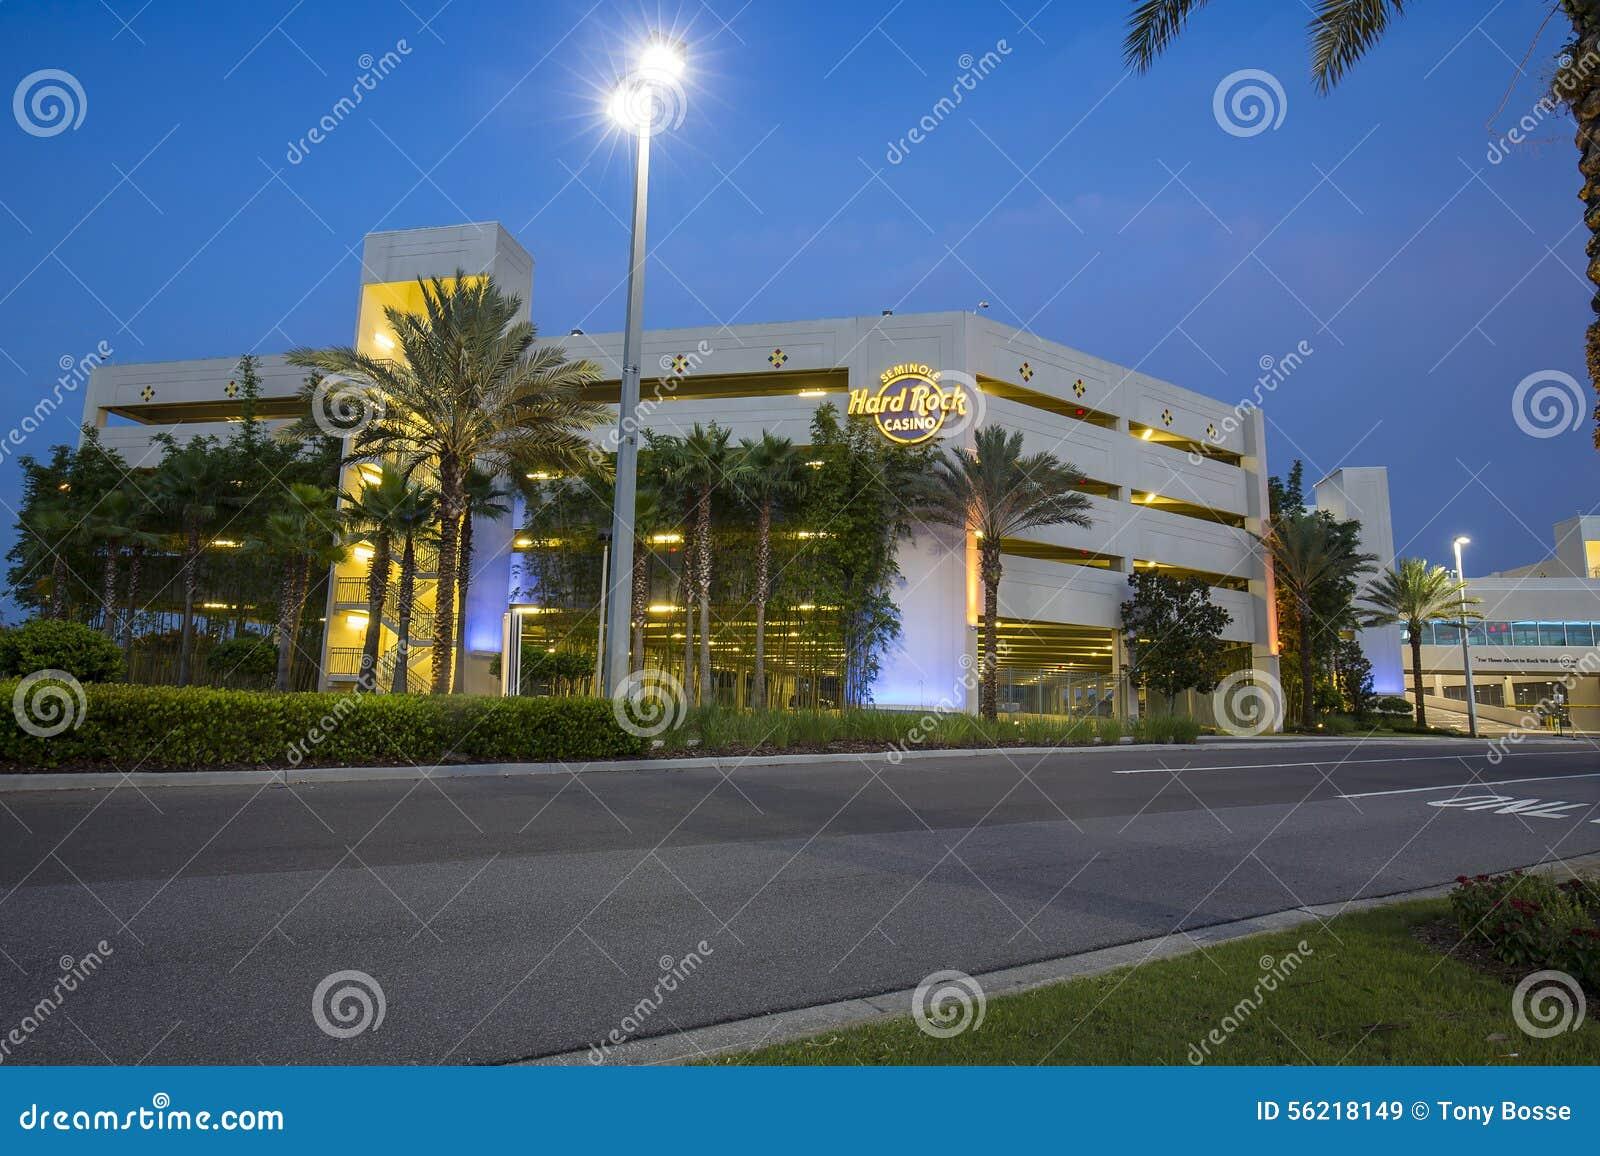 Crown casino nightclubs sunday